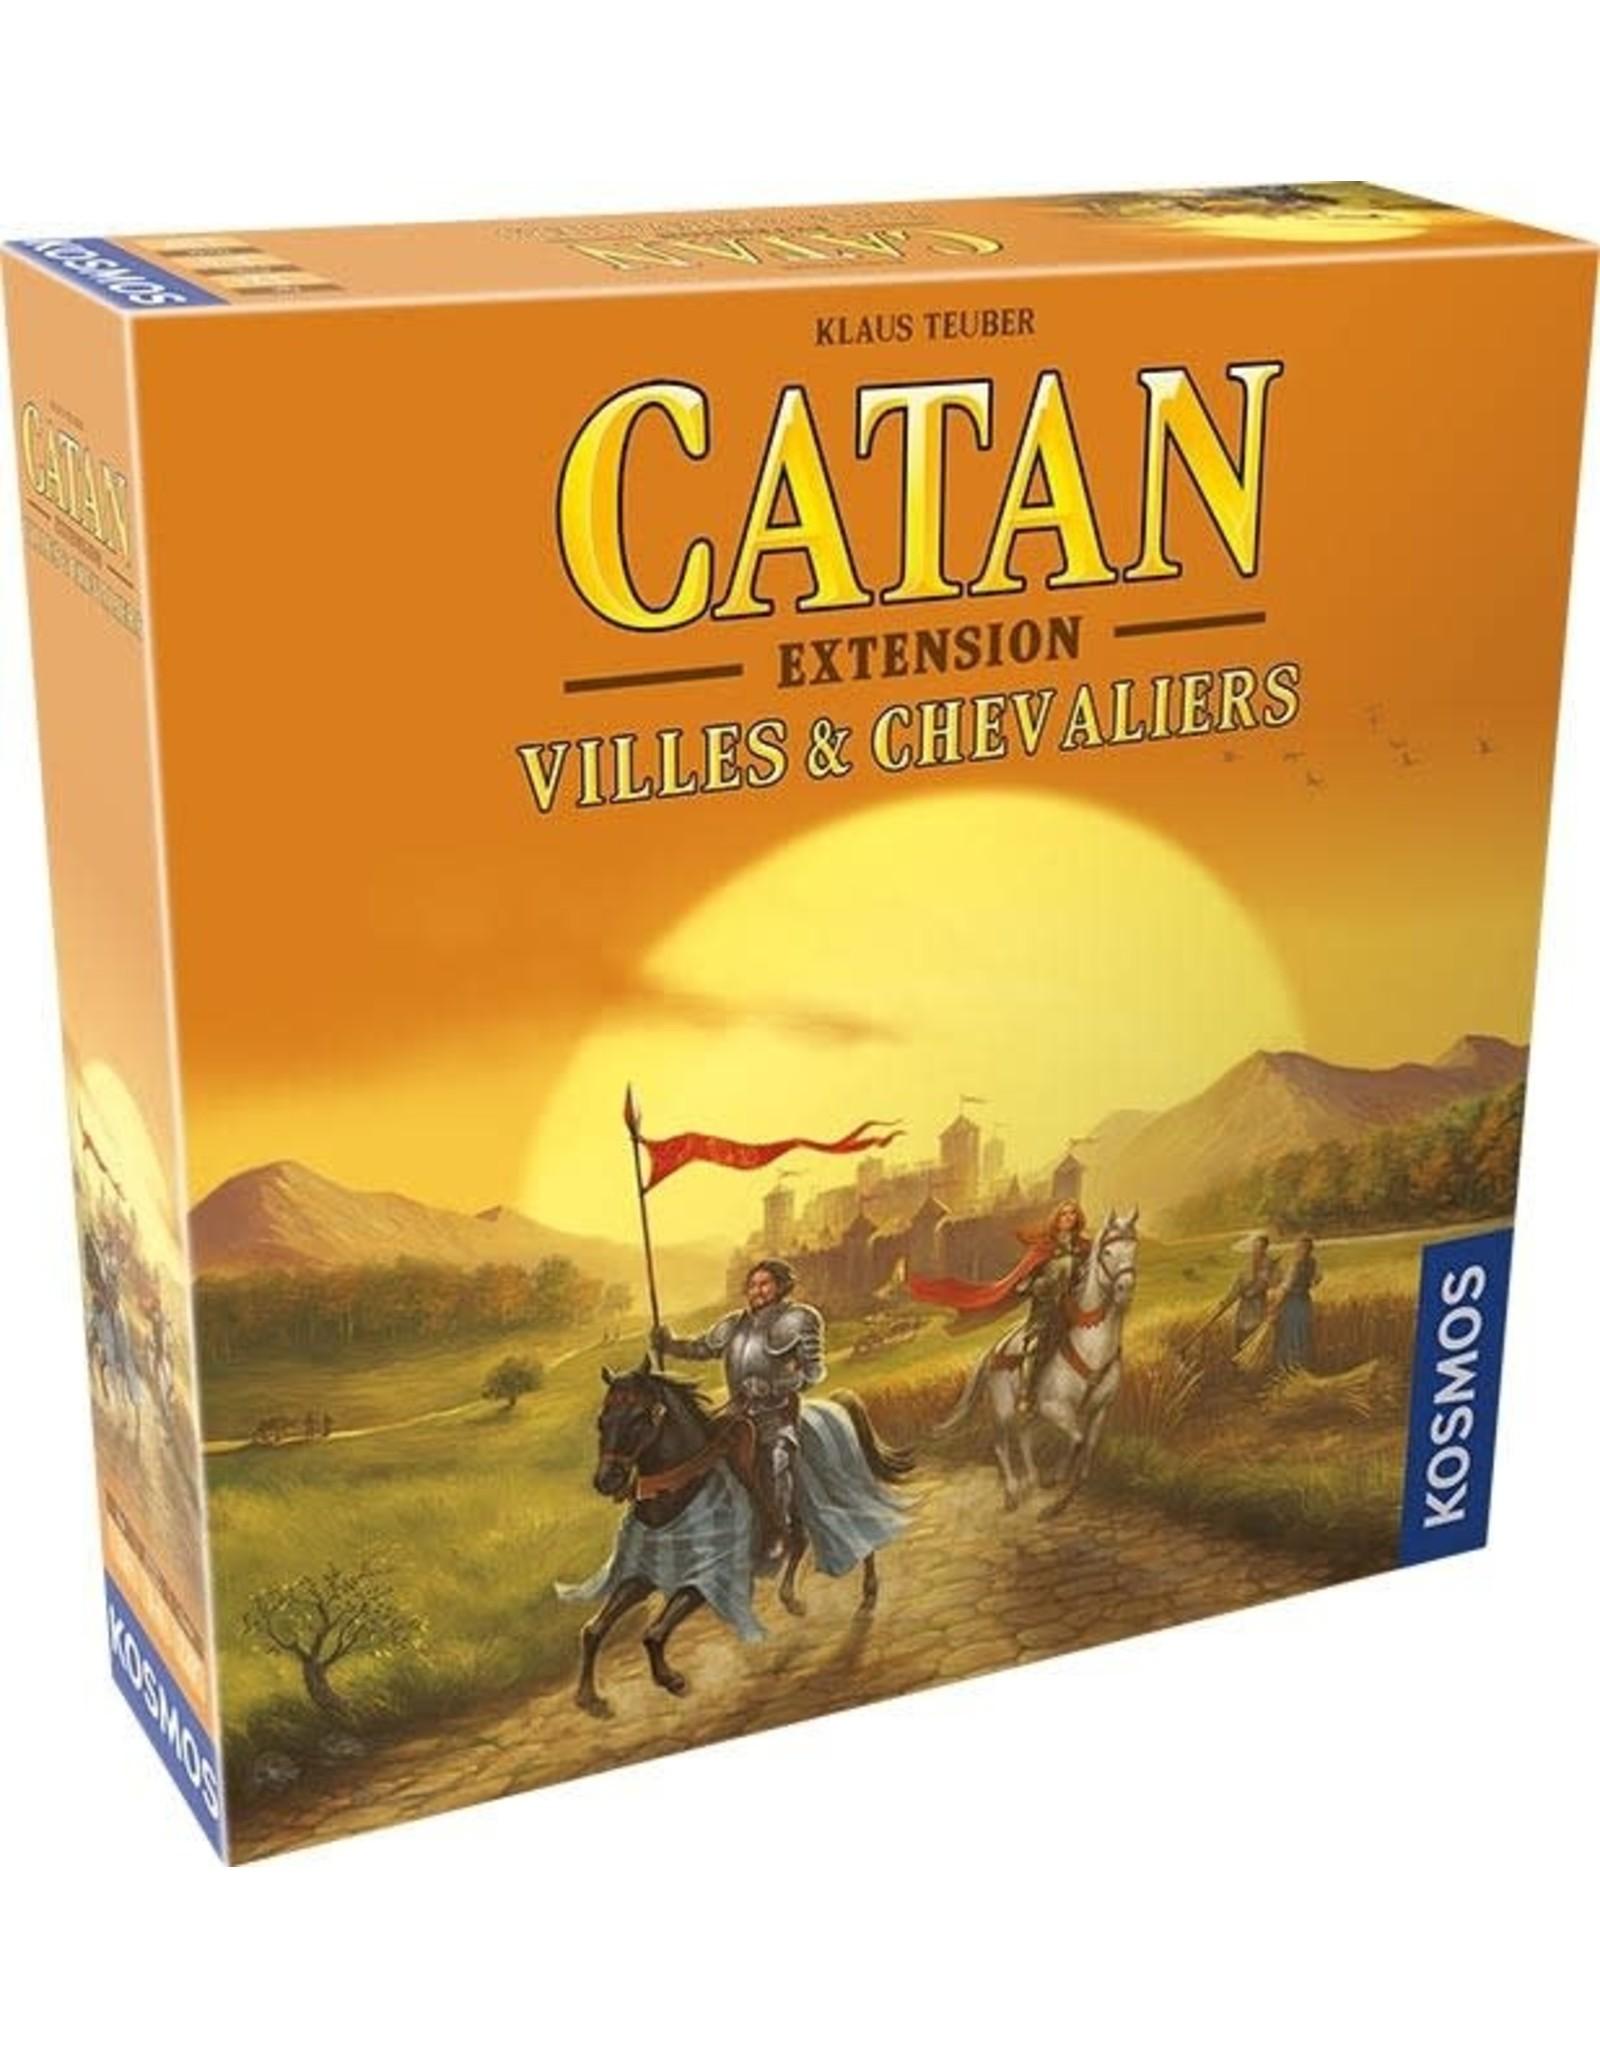 KOSMOS CATAN EXP: VILLES & CHEVALIERS